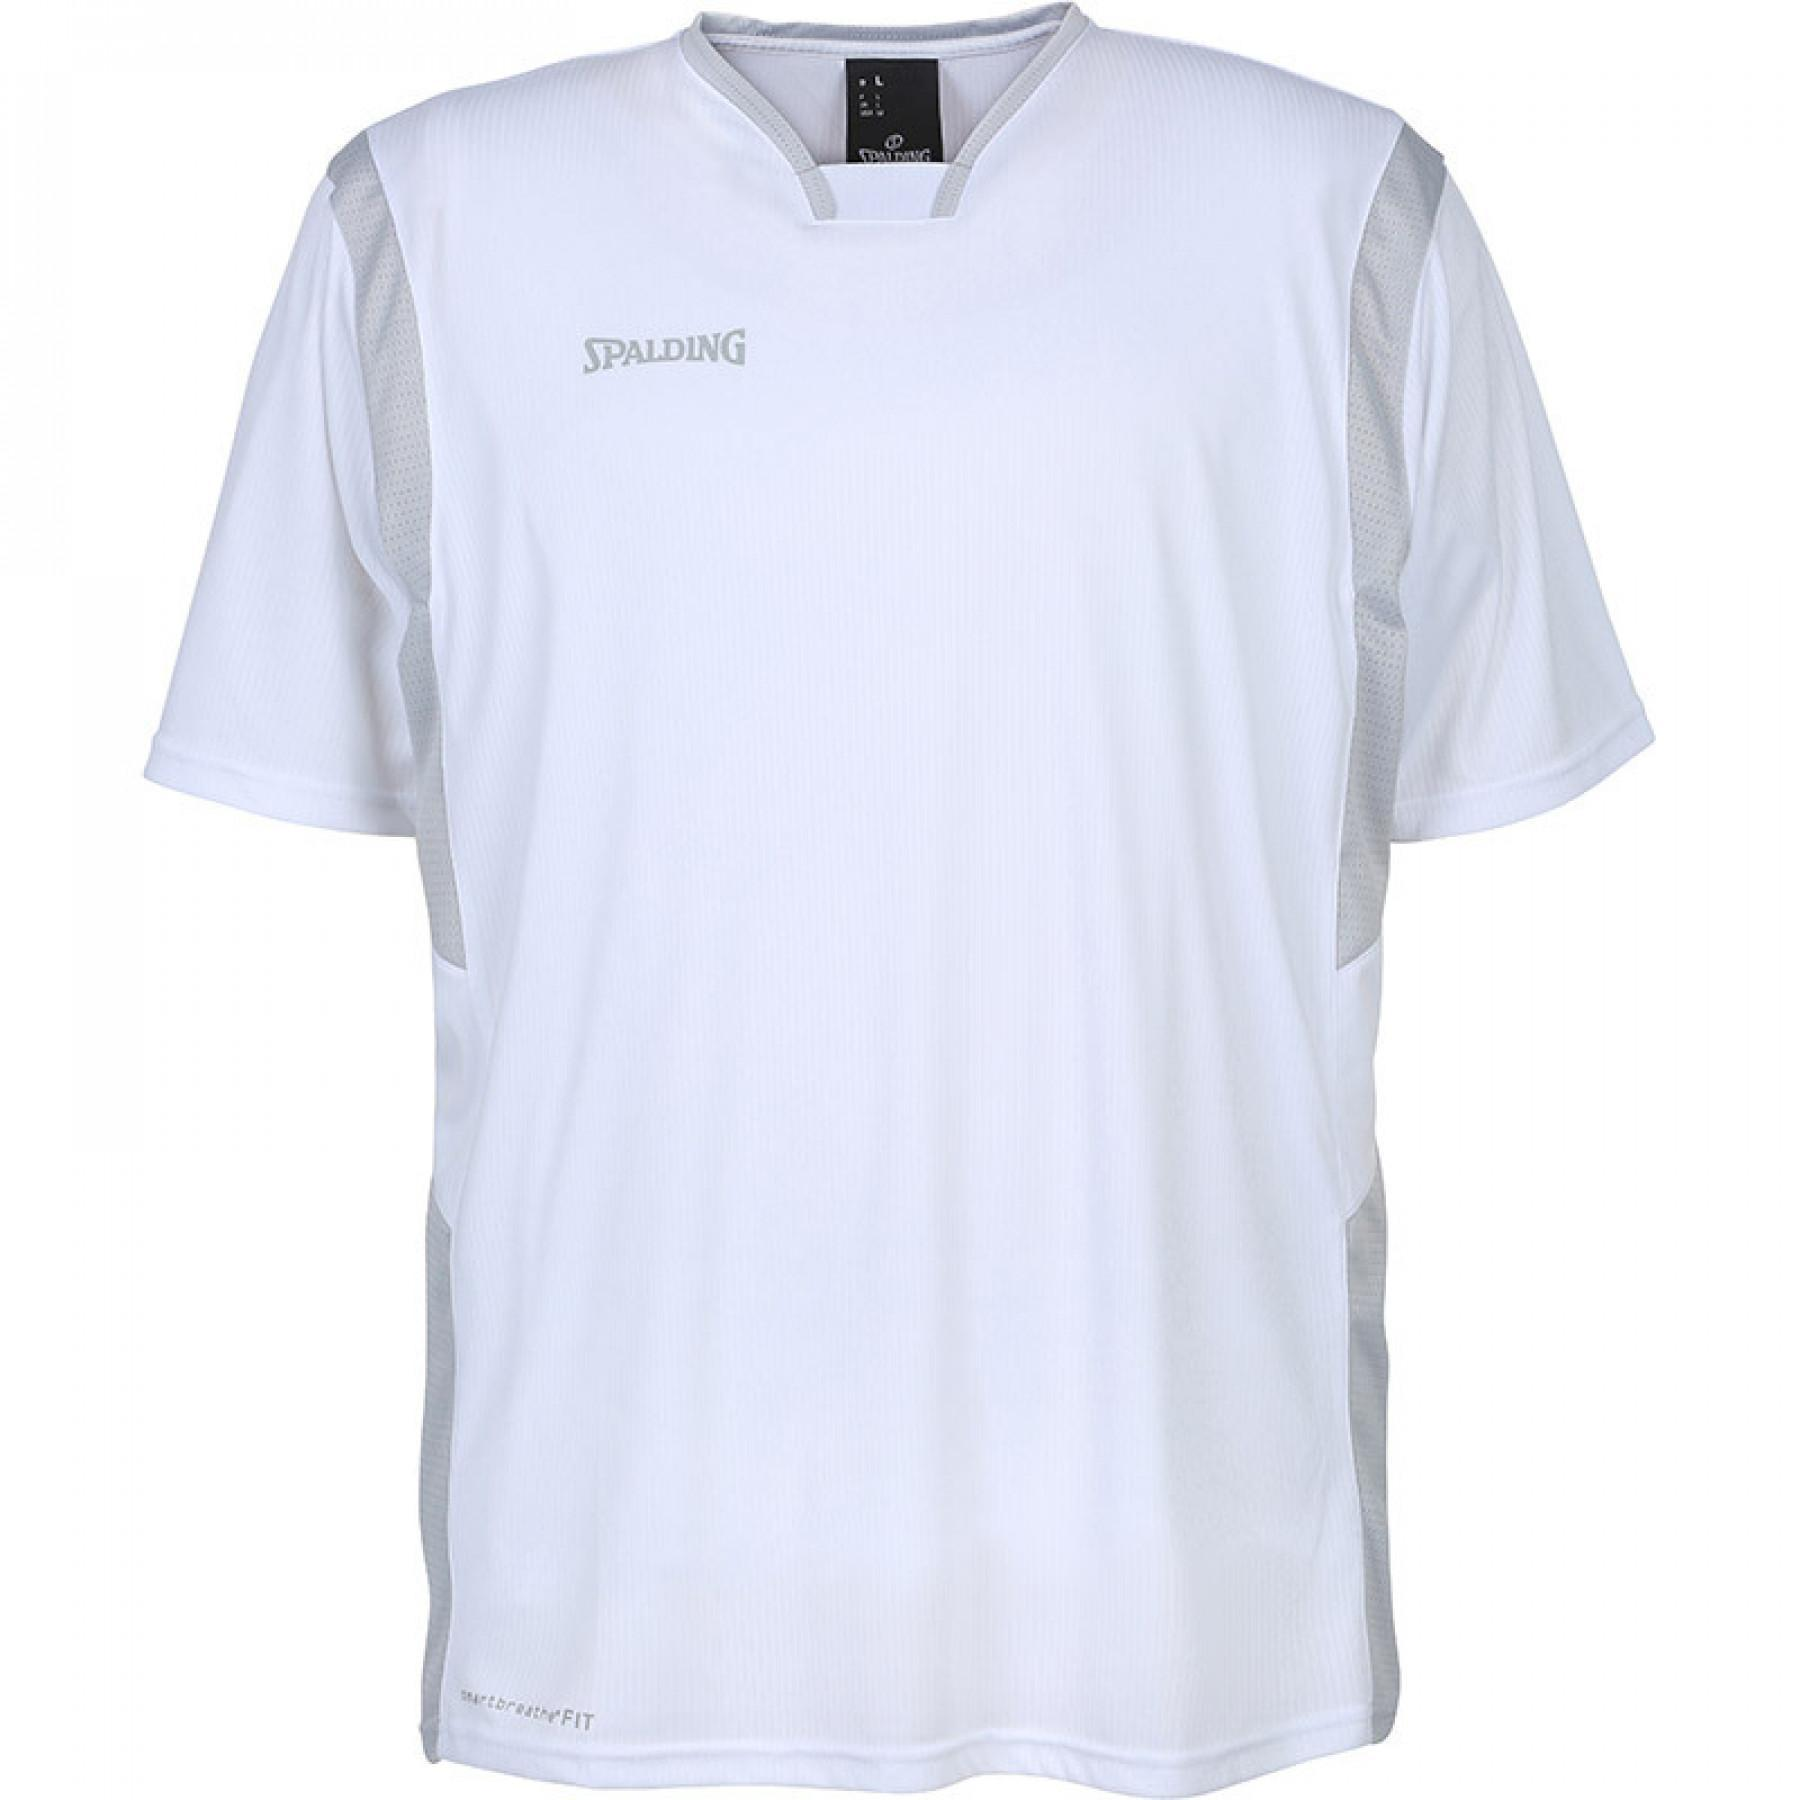 Spalding All Star T-shirt